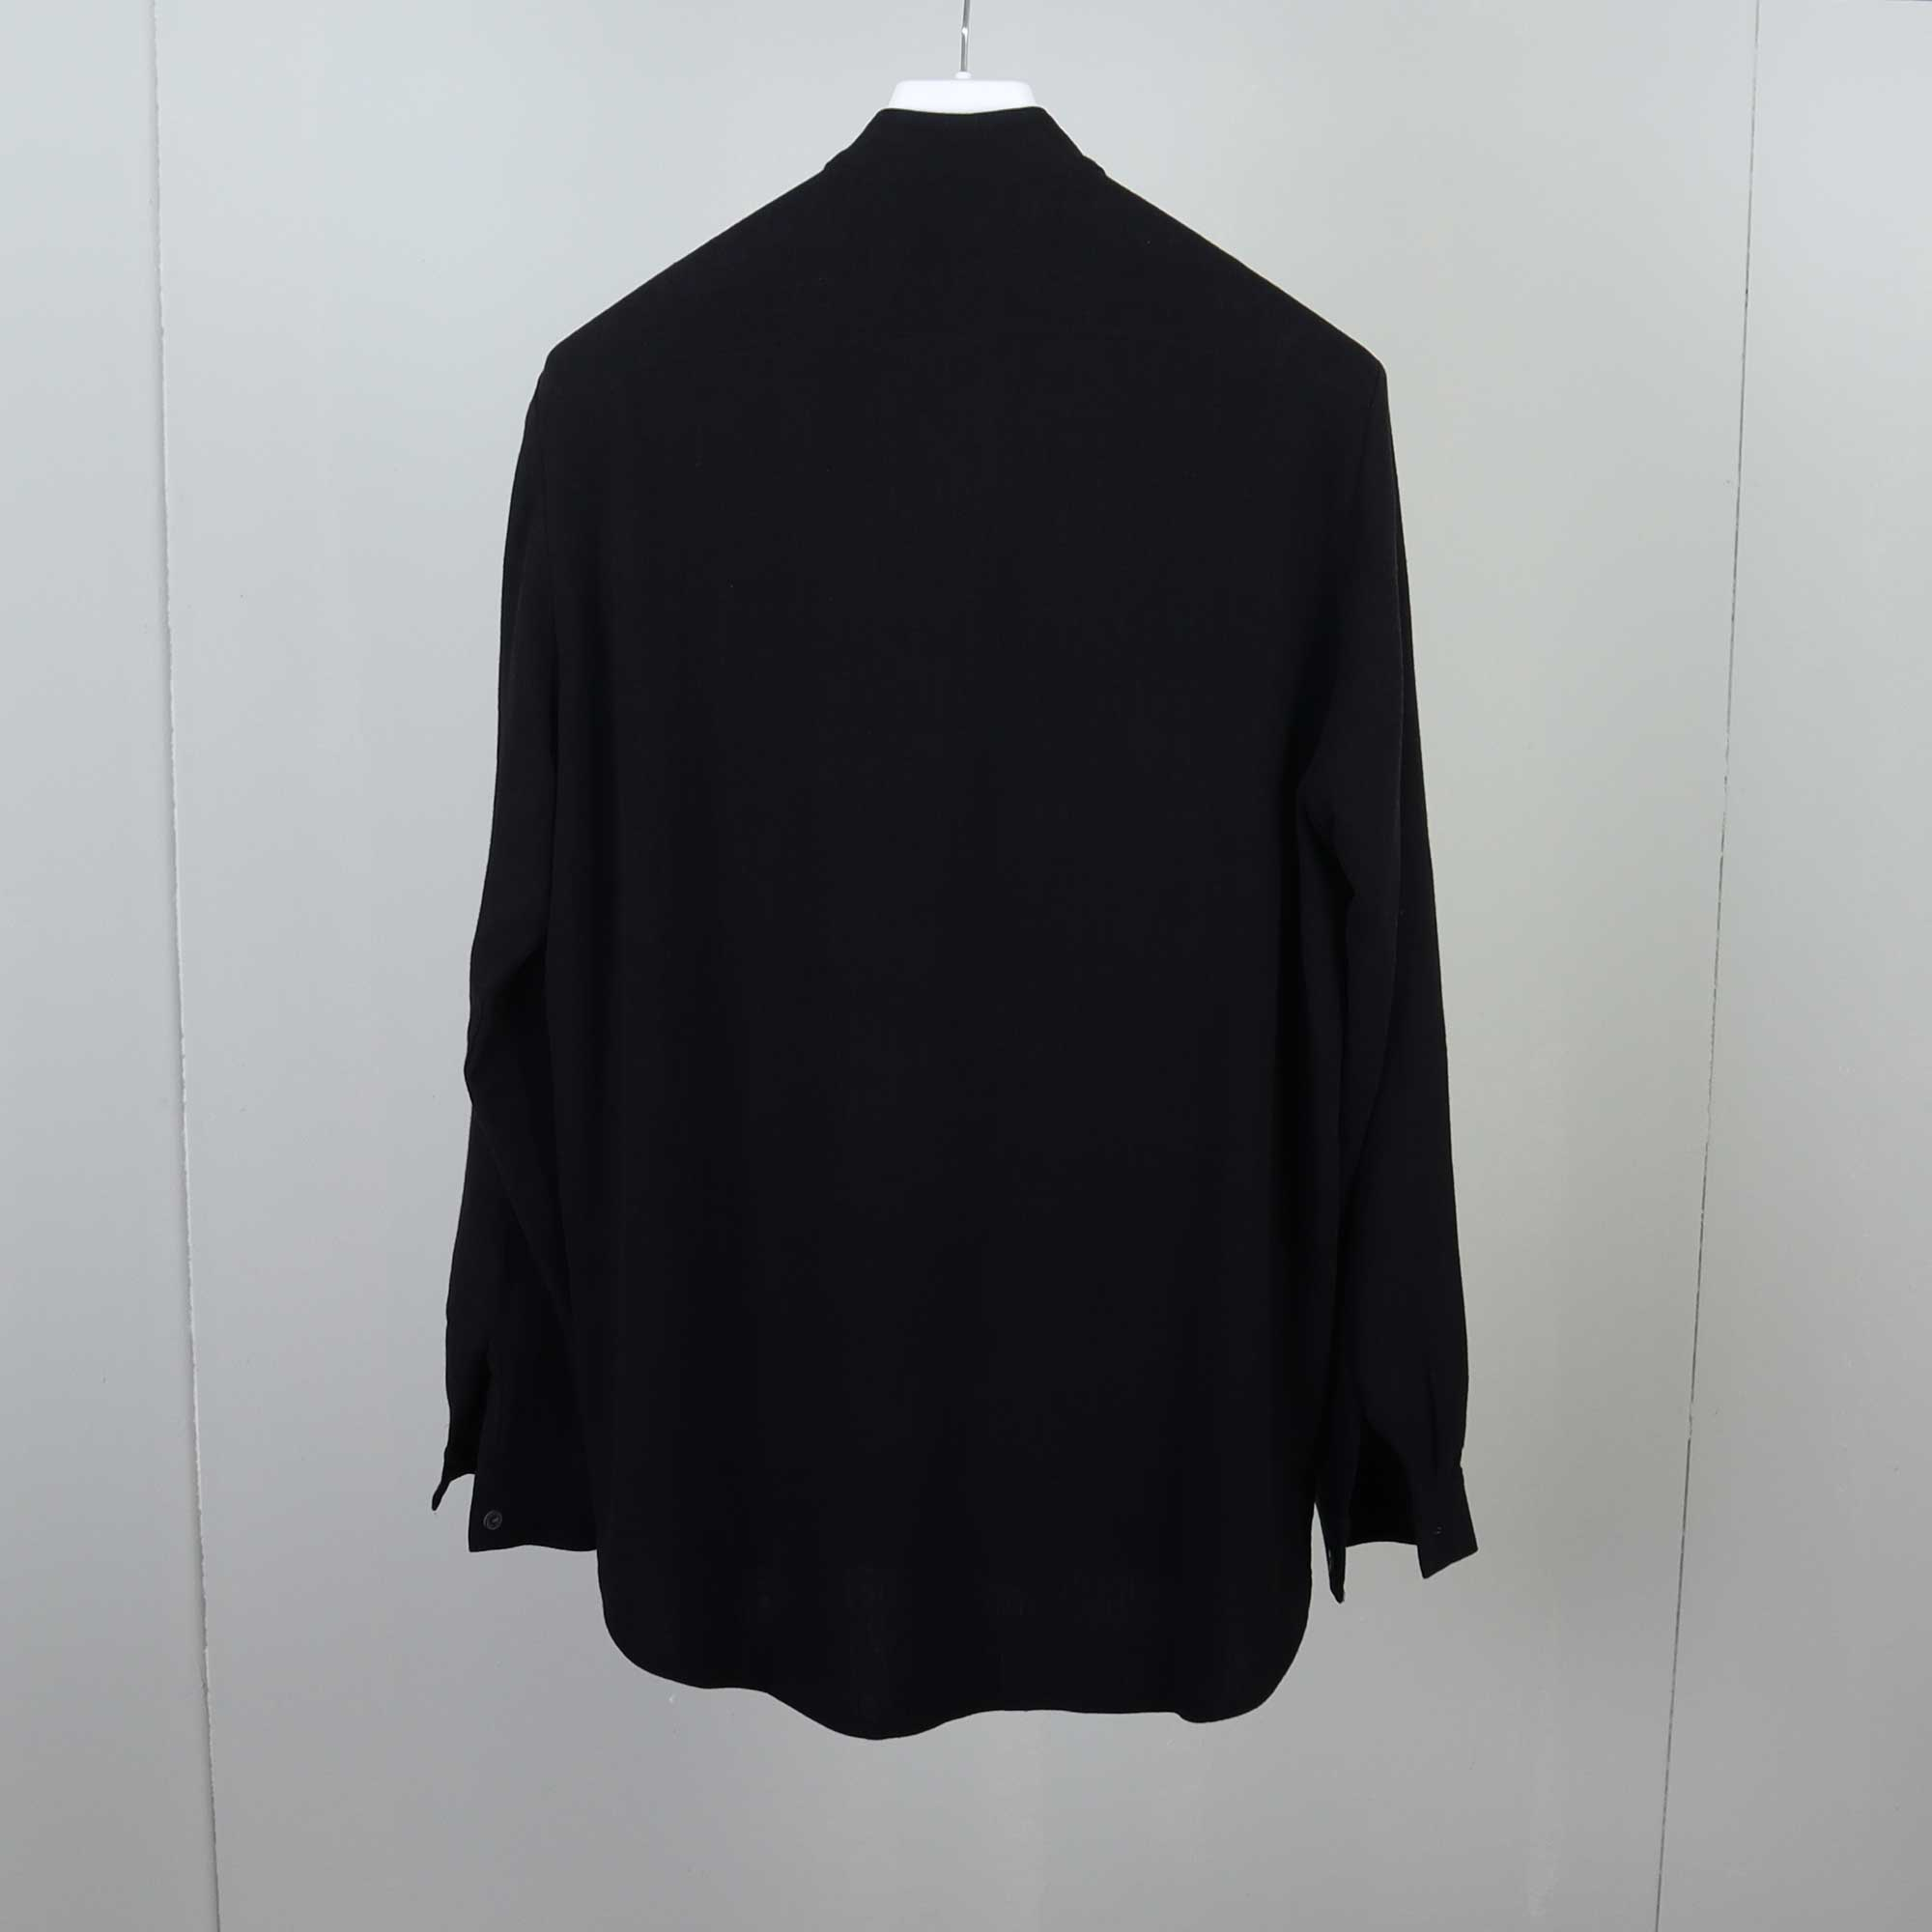 zippy-zwart-4